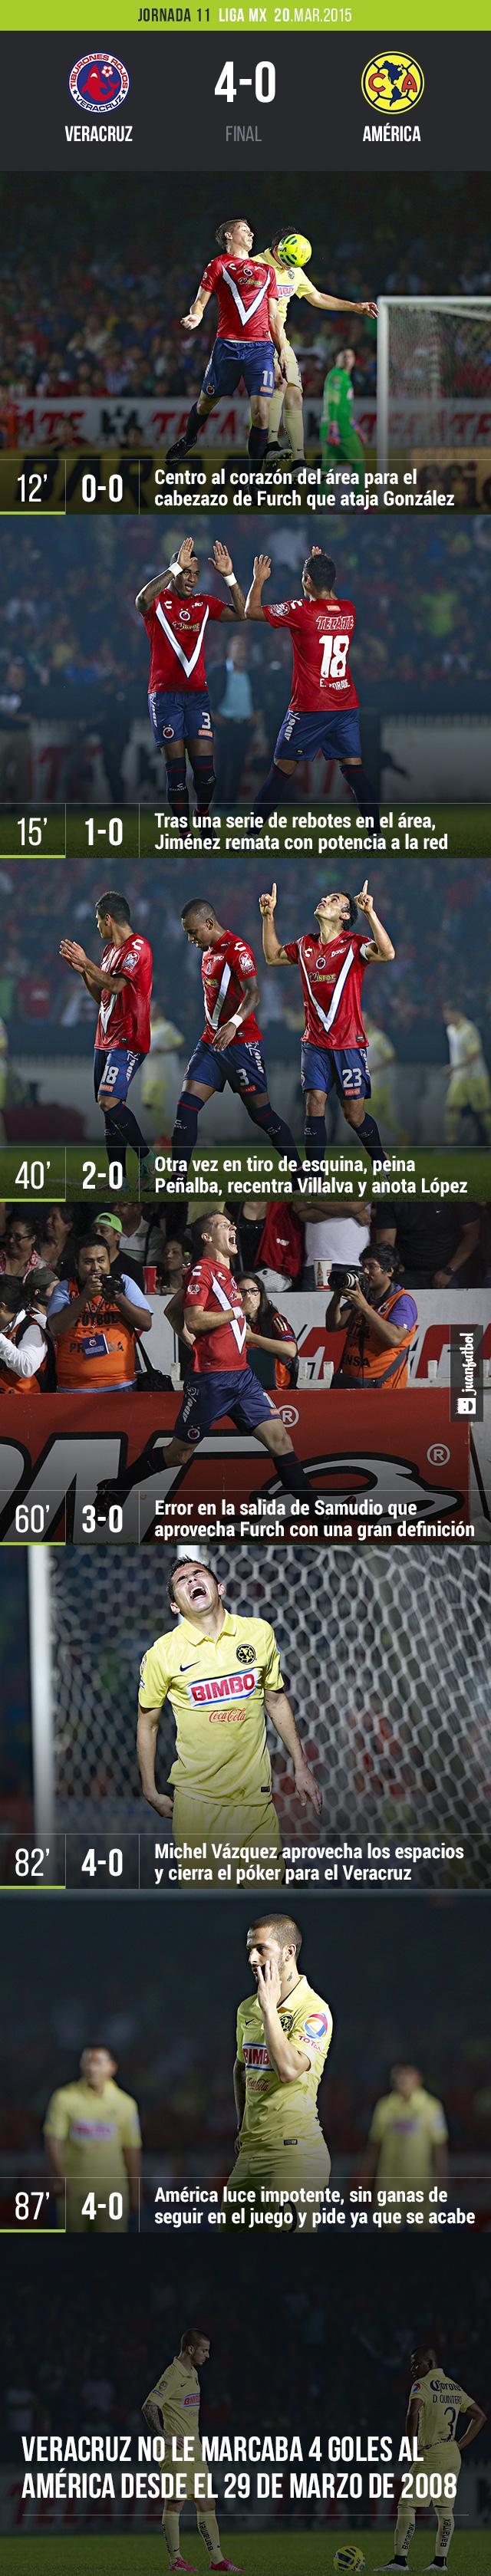 Veracruz 4-0 América